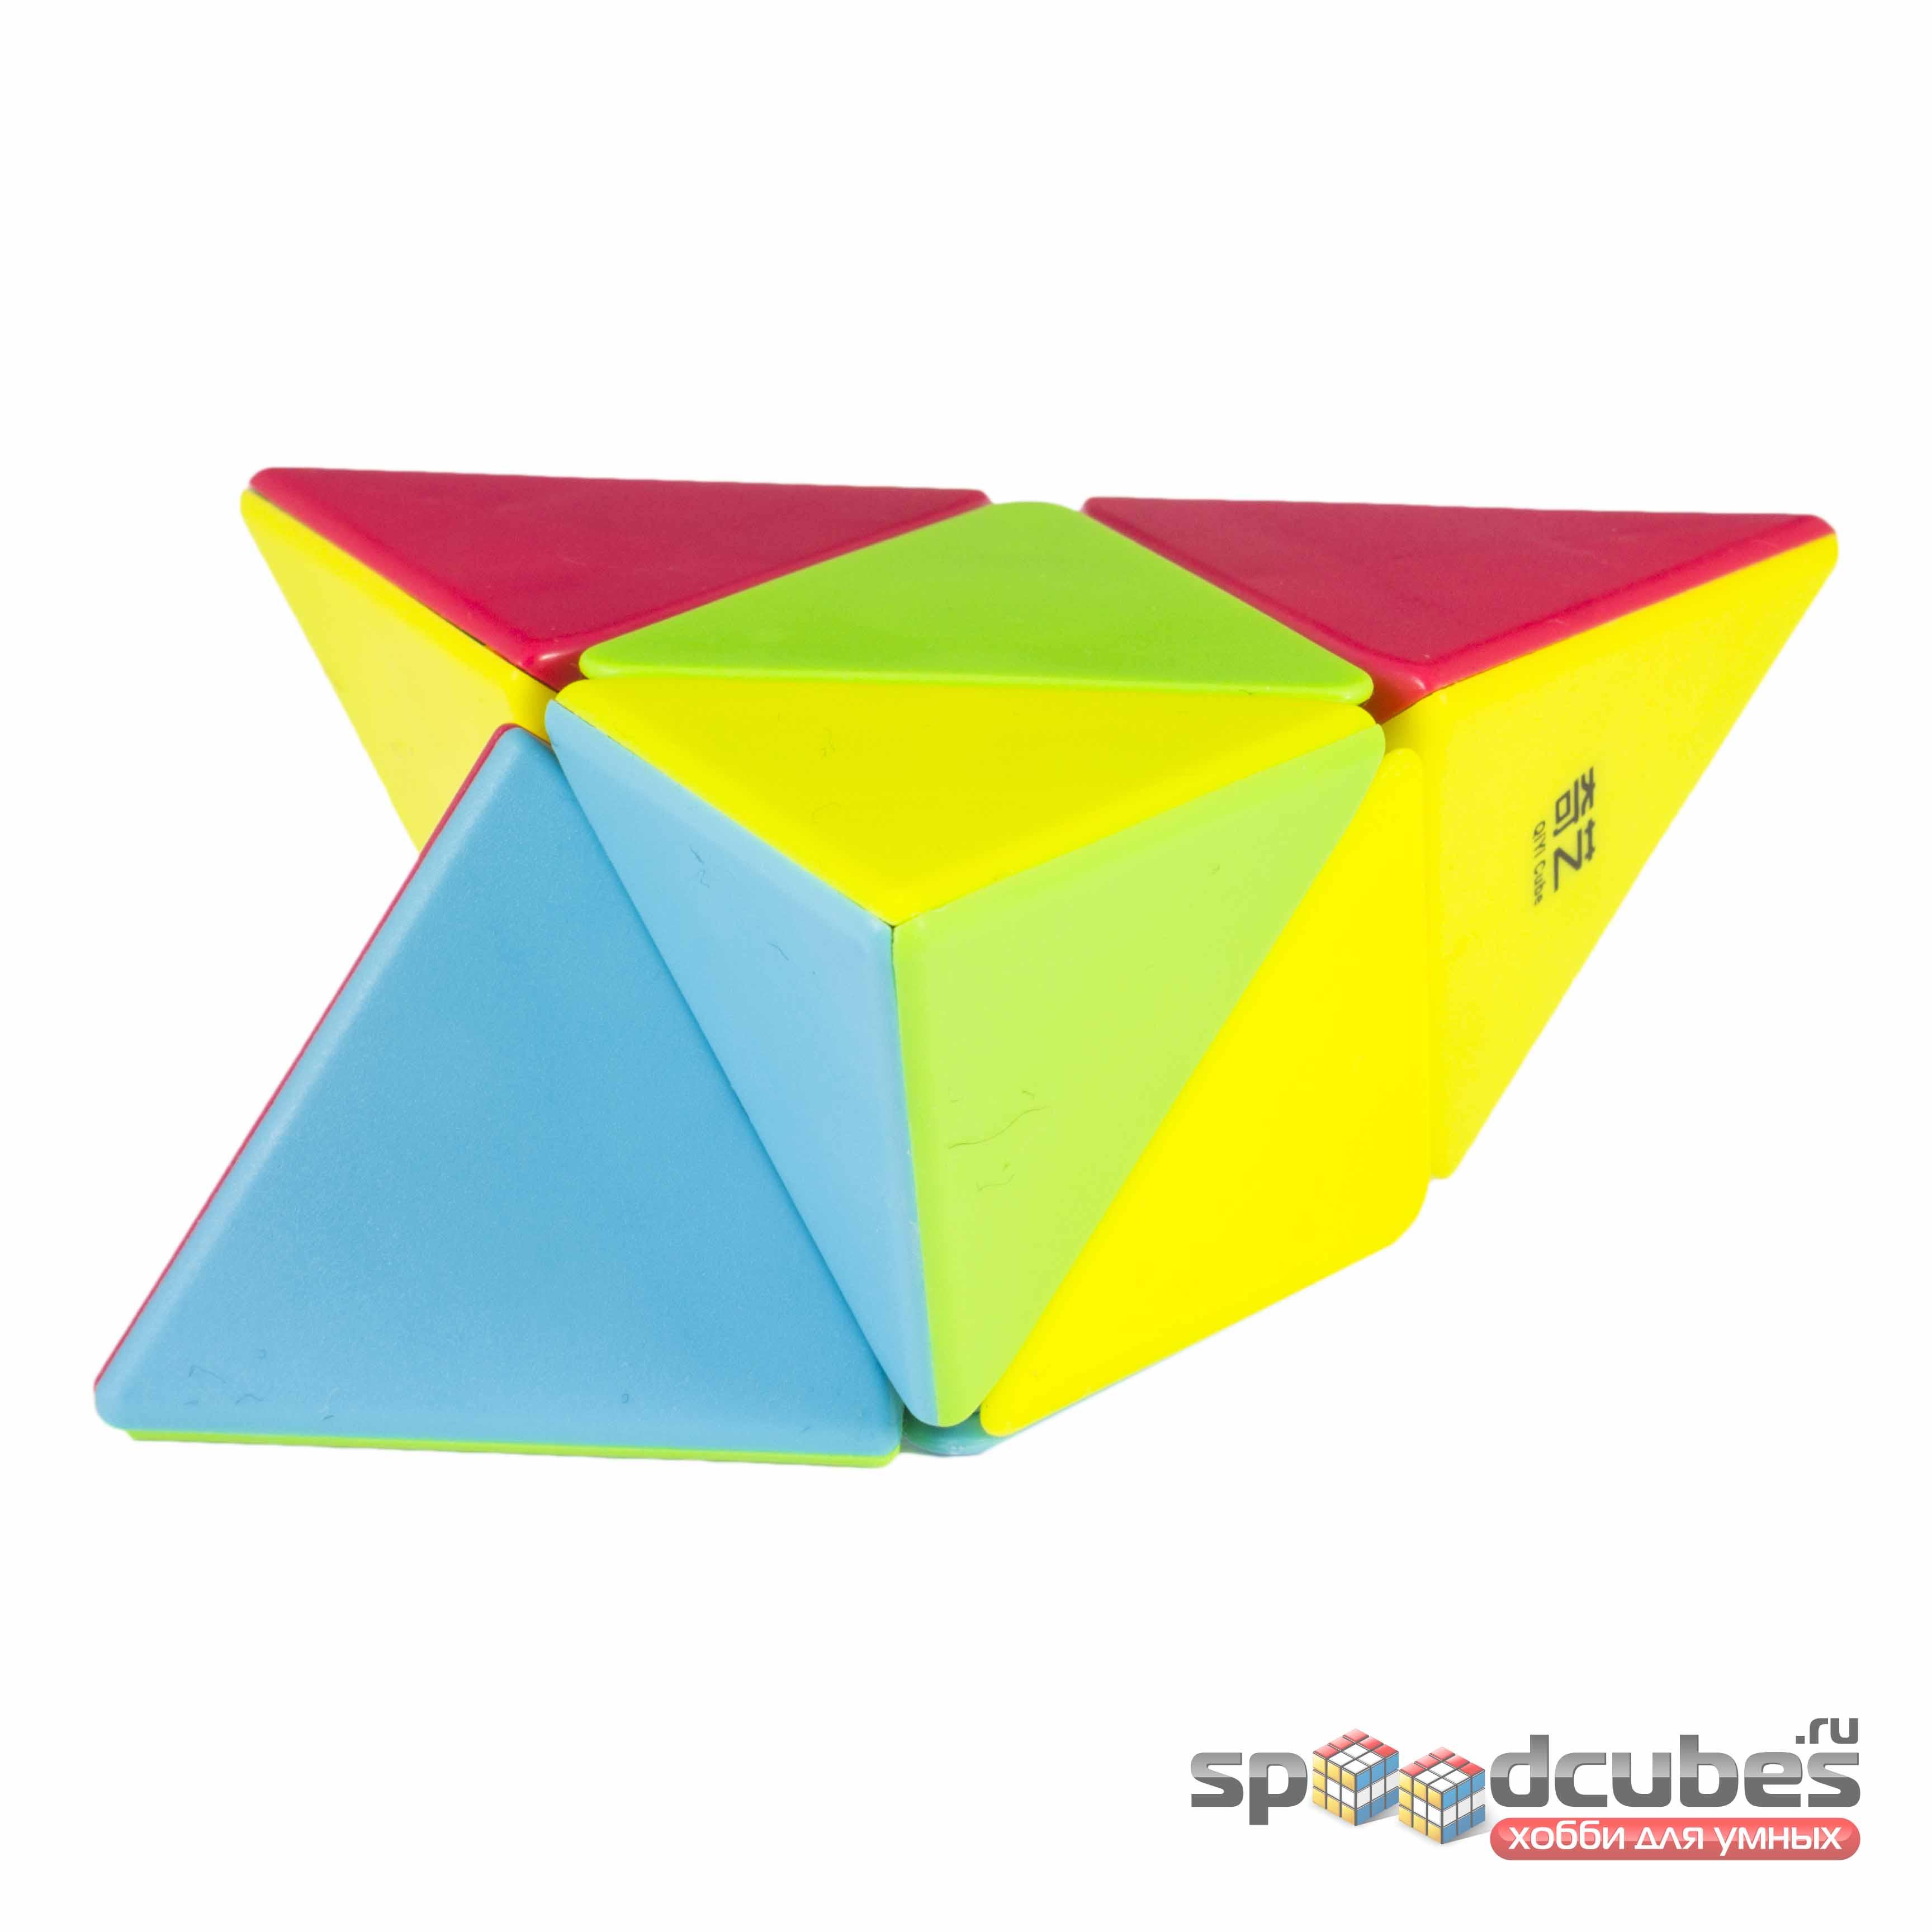 QiYi (MoFangGe) Pyraminx 2x2x2 Color 3